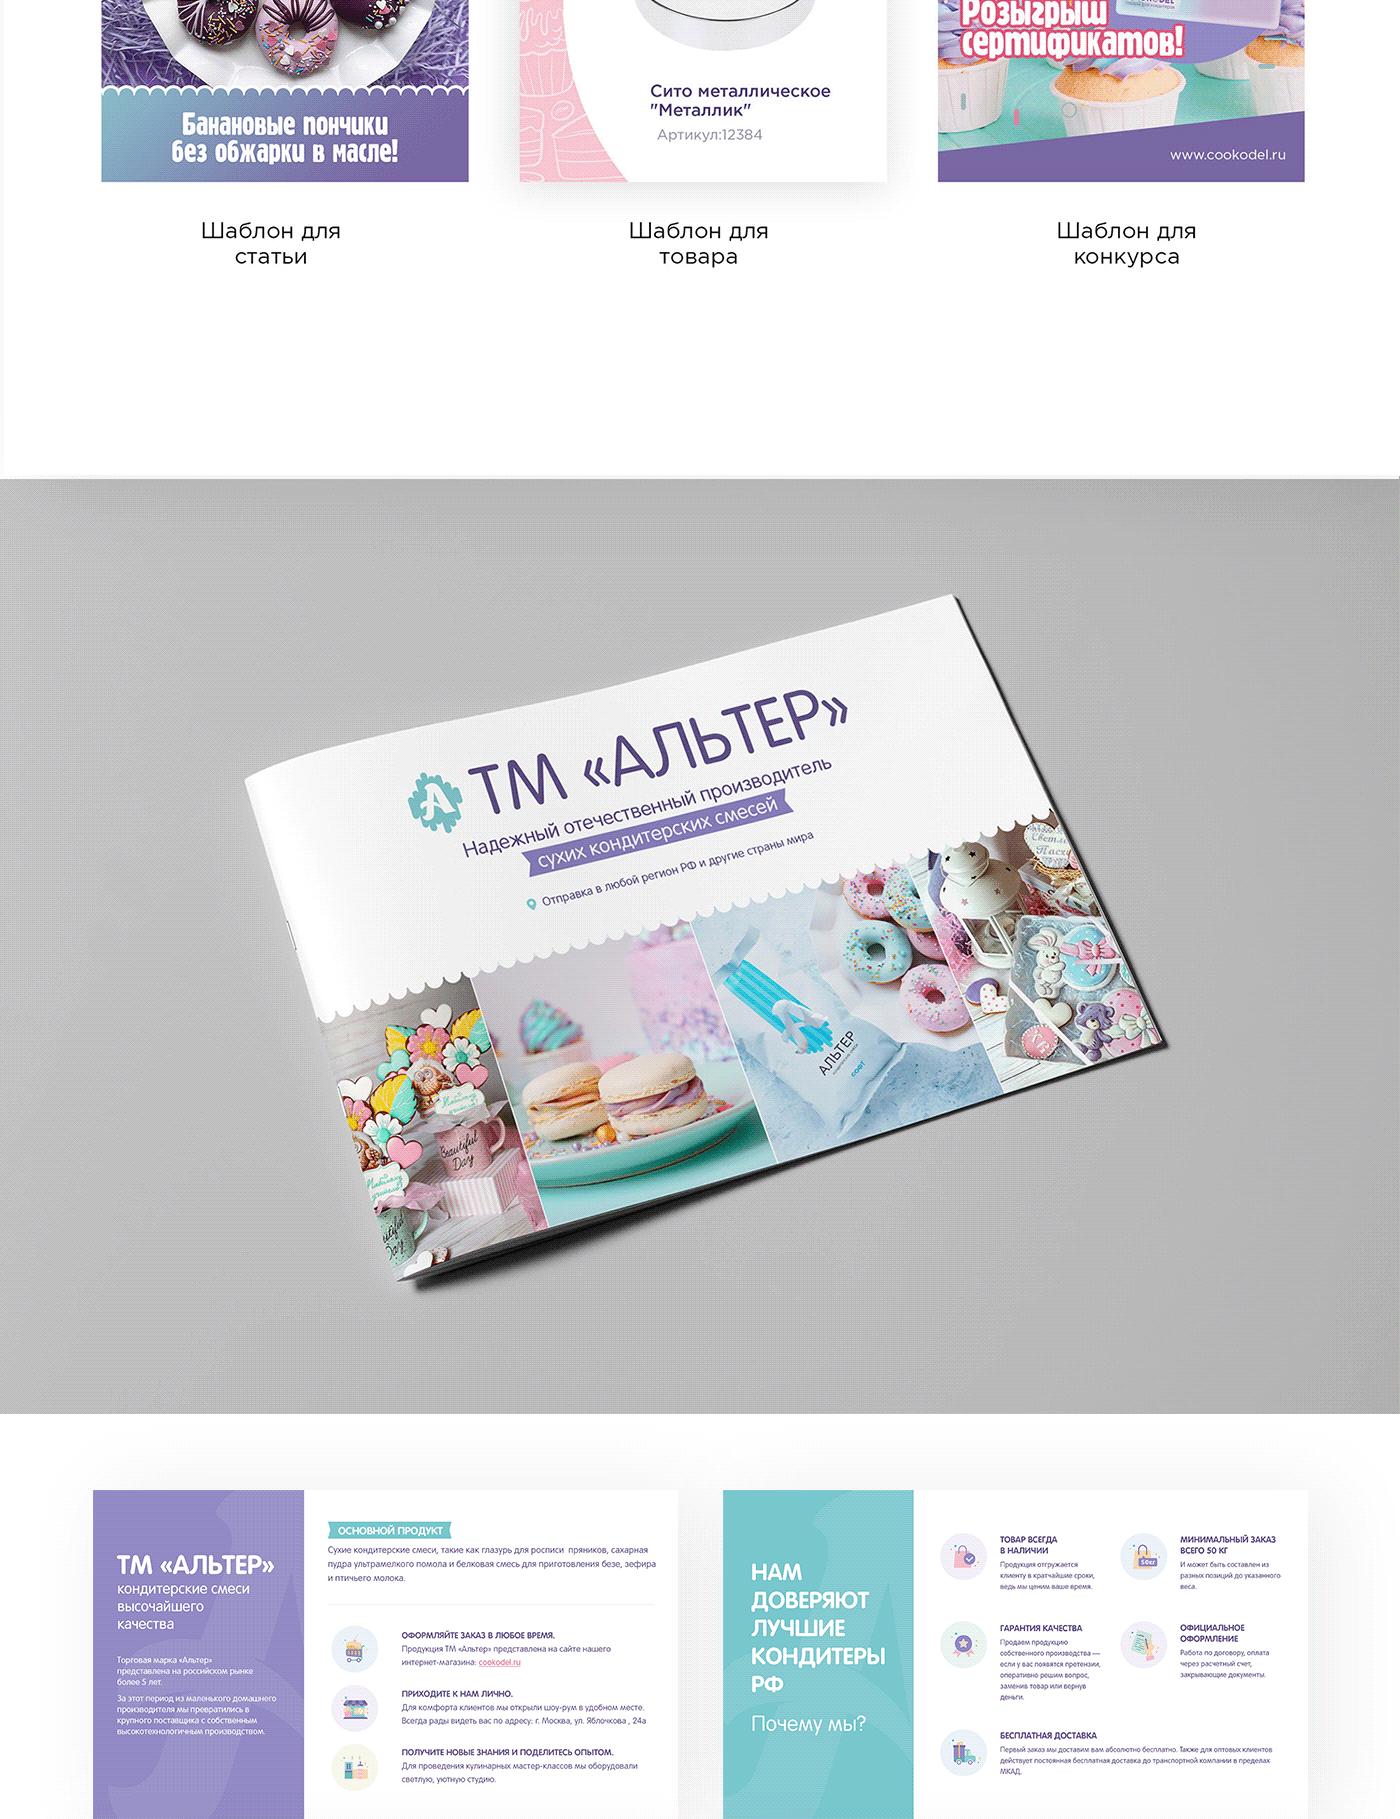 Image may contain: print and card